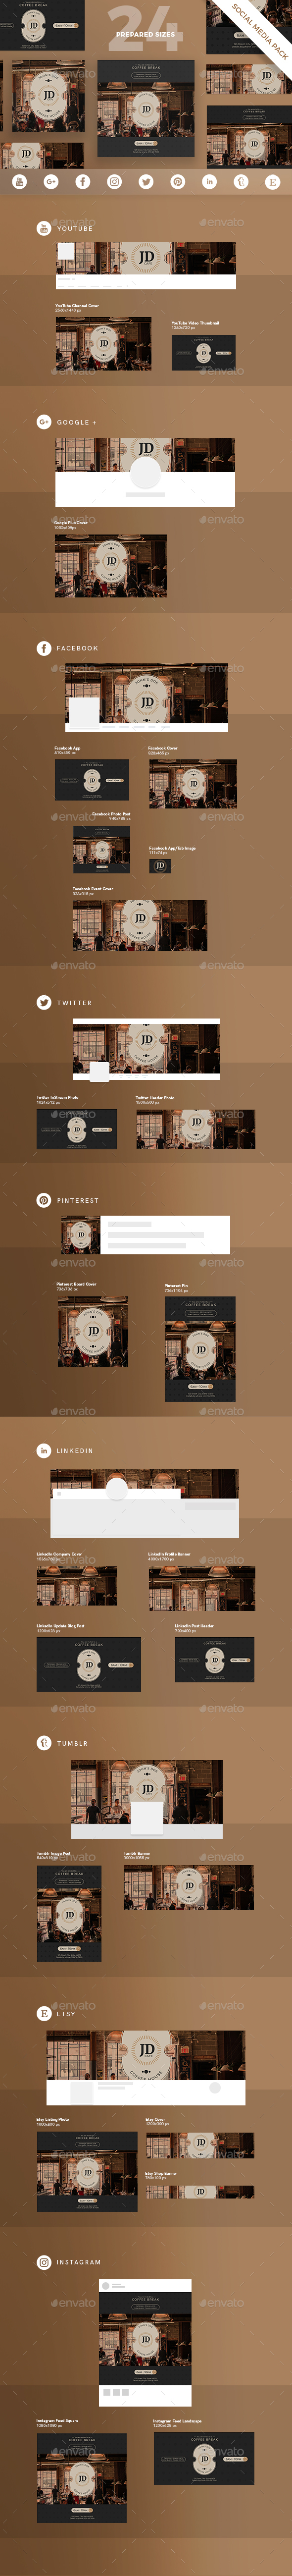 GraphicRiver Coffee Break Social Media Pack 21129197